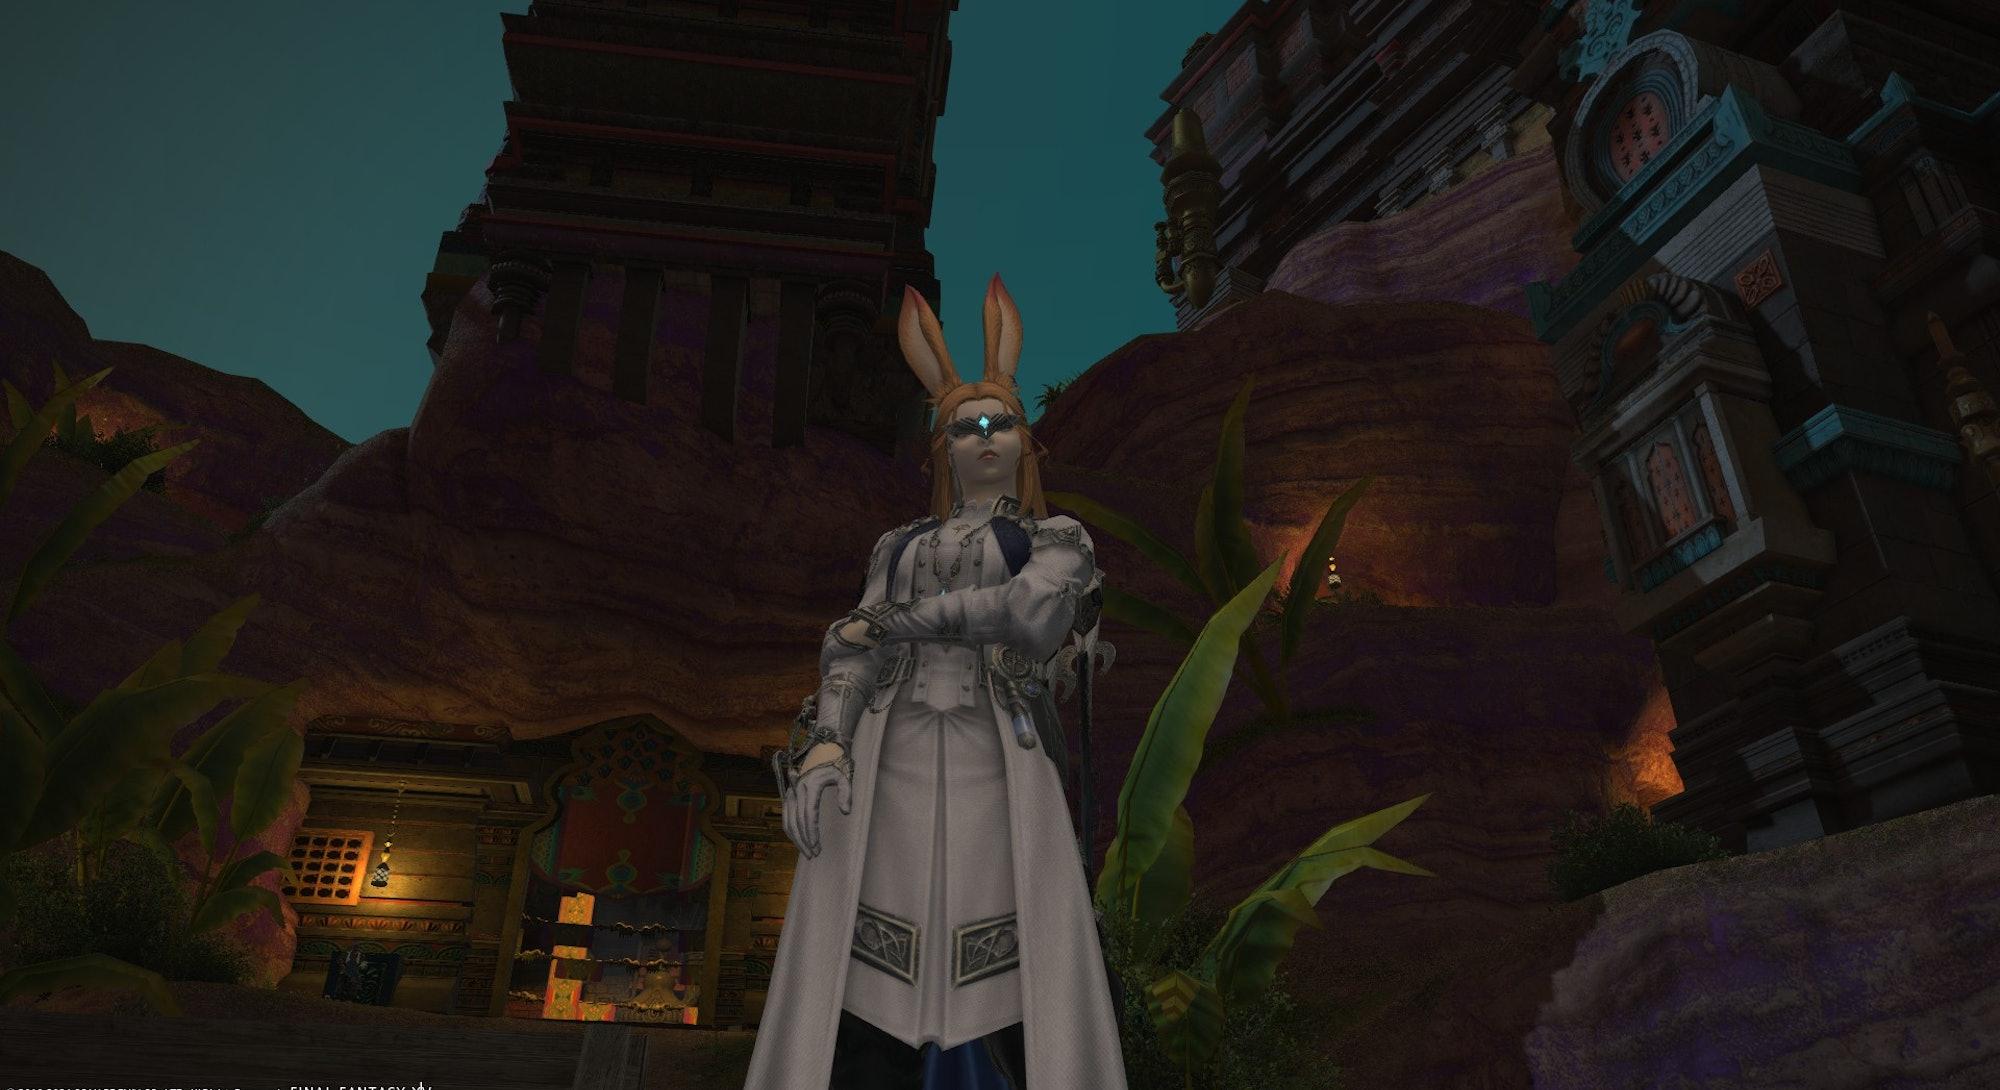 screenshot from Final Fantasy XIV Endwalker